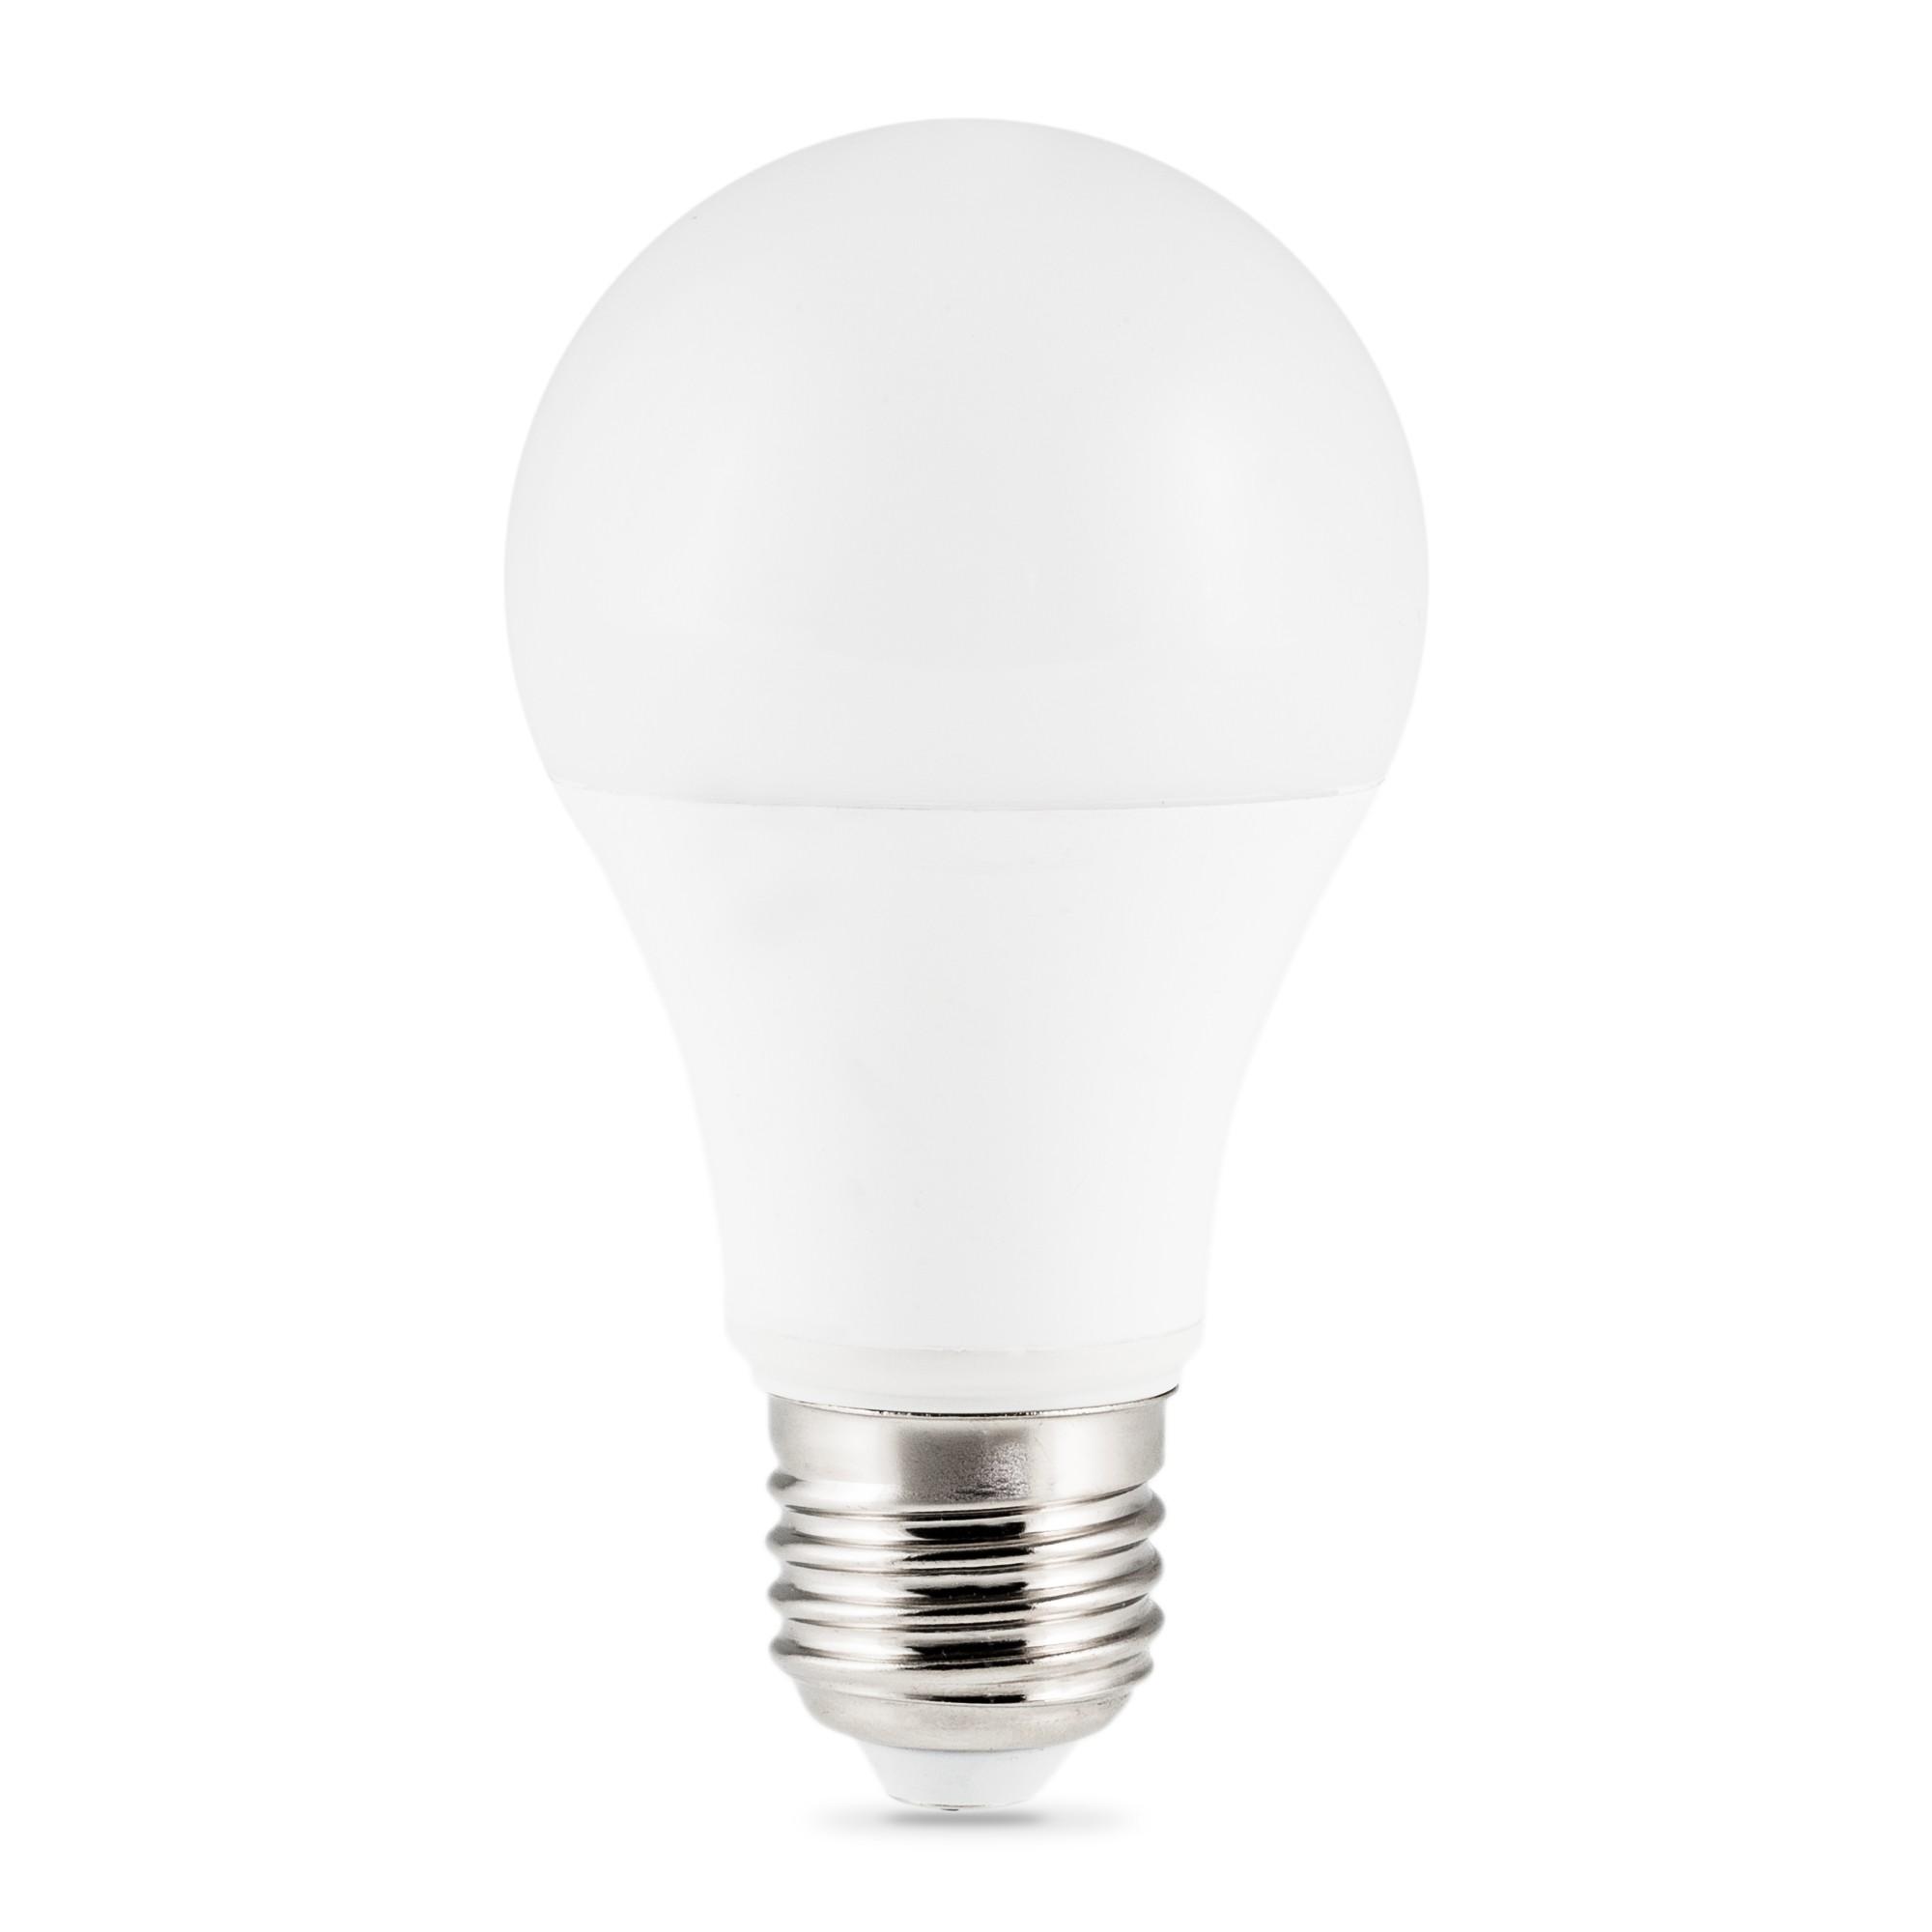 E27-3COLOR-10W---20 Faszinierend Led Leuchtmittel E27 10w Dekorationen